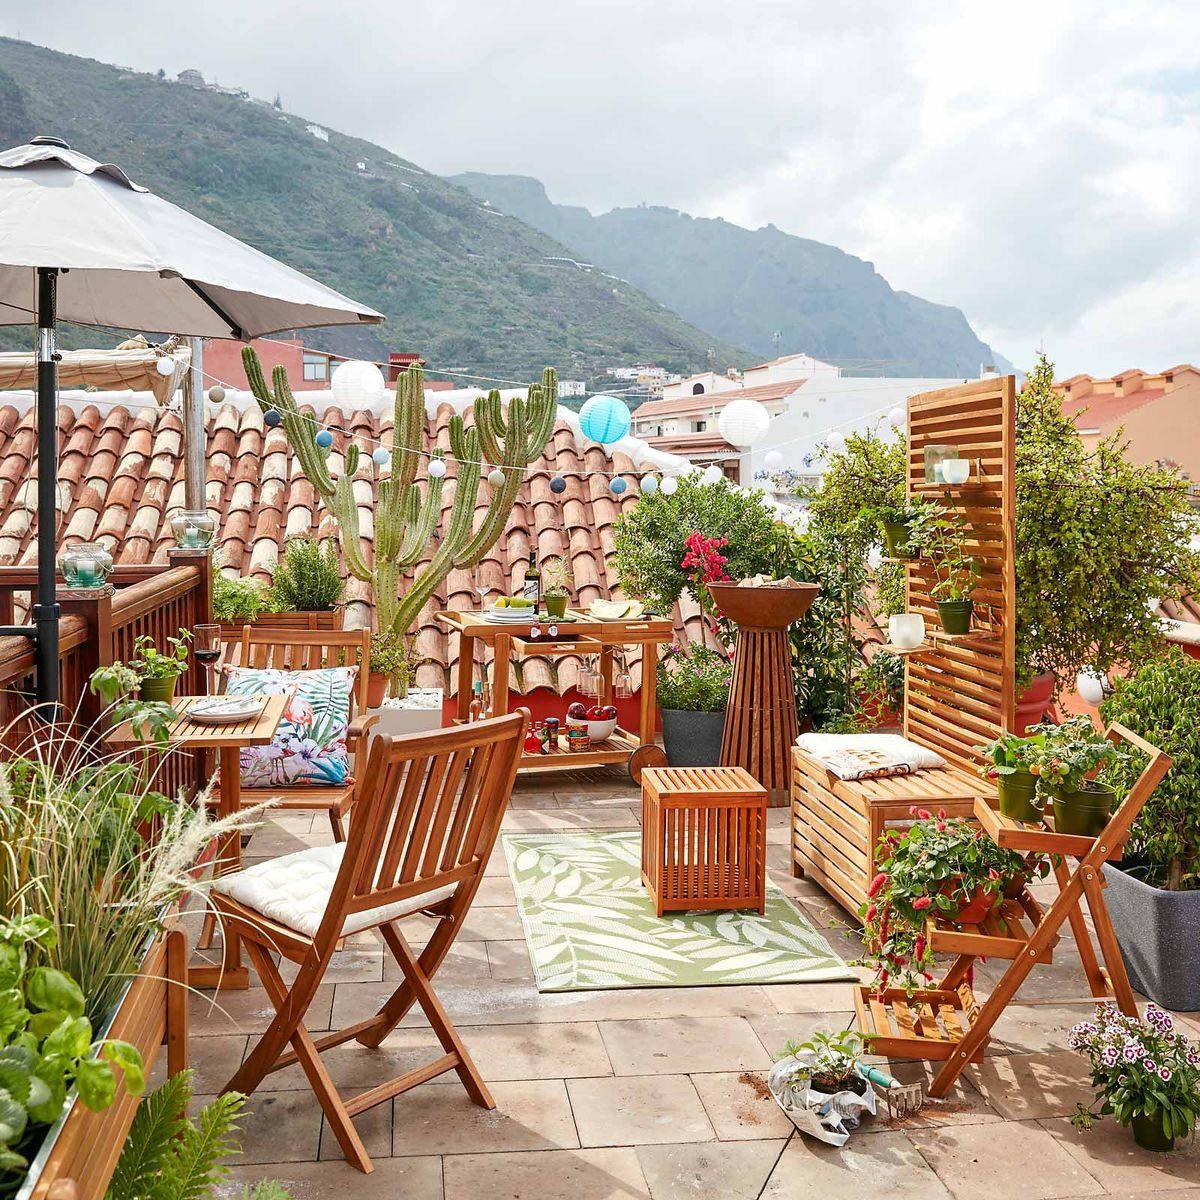 balkon sichtschutz tchibo tchibo balkon sichtschutz haus planen balkon sichtschutz tchibo. Black Bedroom Furniture Sets. Home Design Ideas